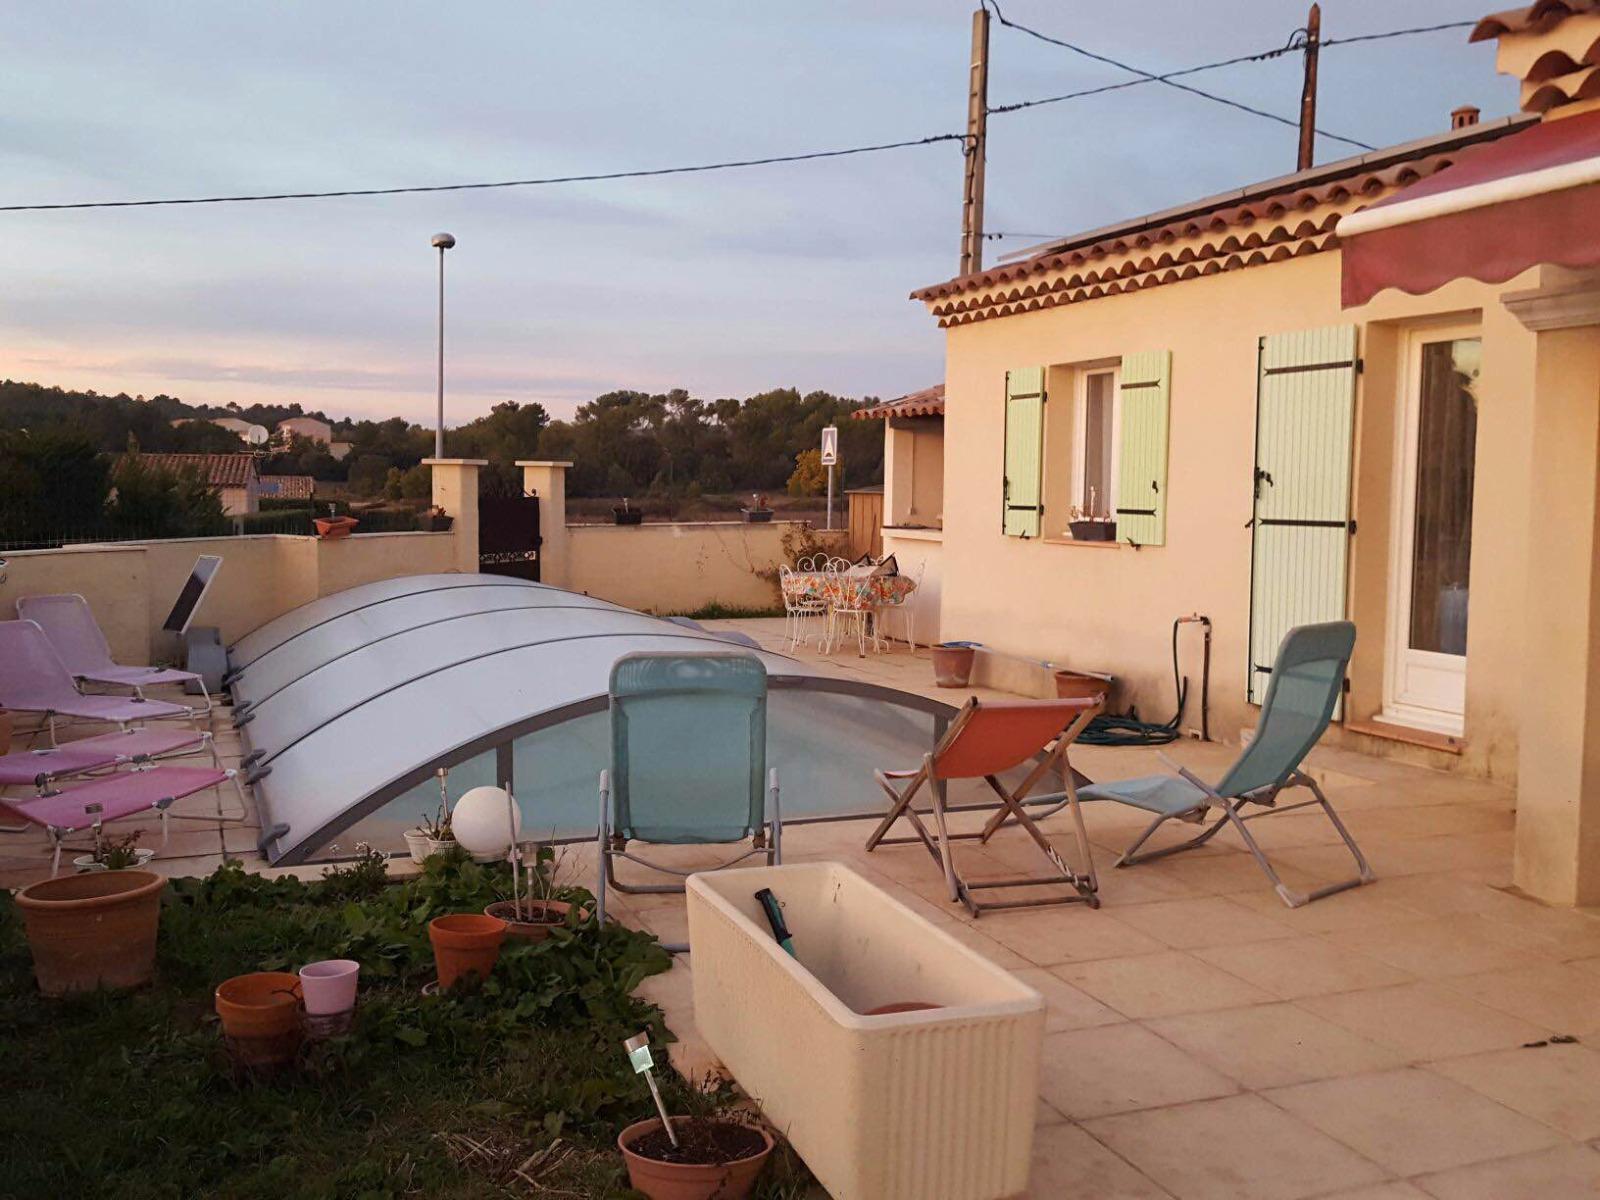 St julien villa avec piscine agence les clefs du verdon for Piscine julien